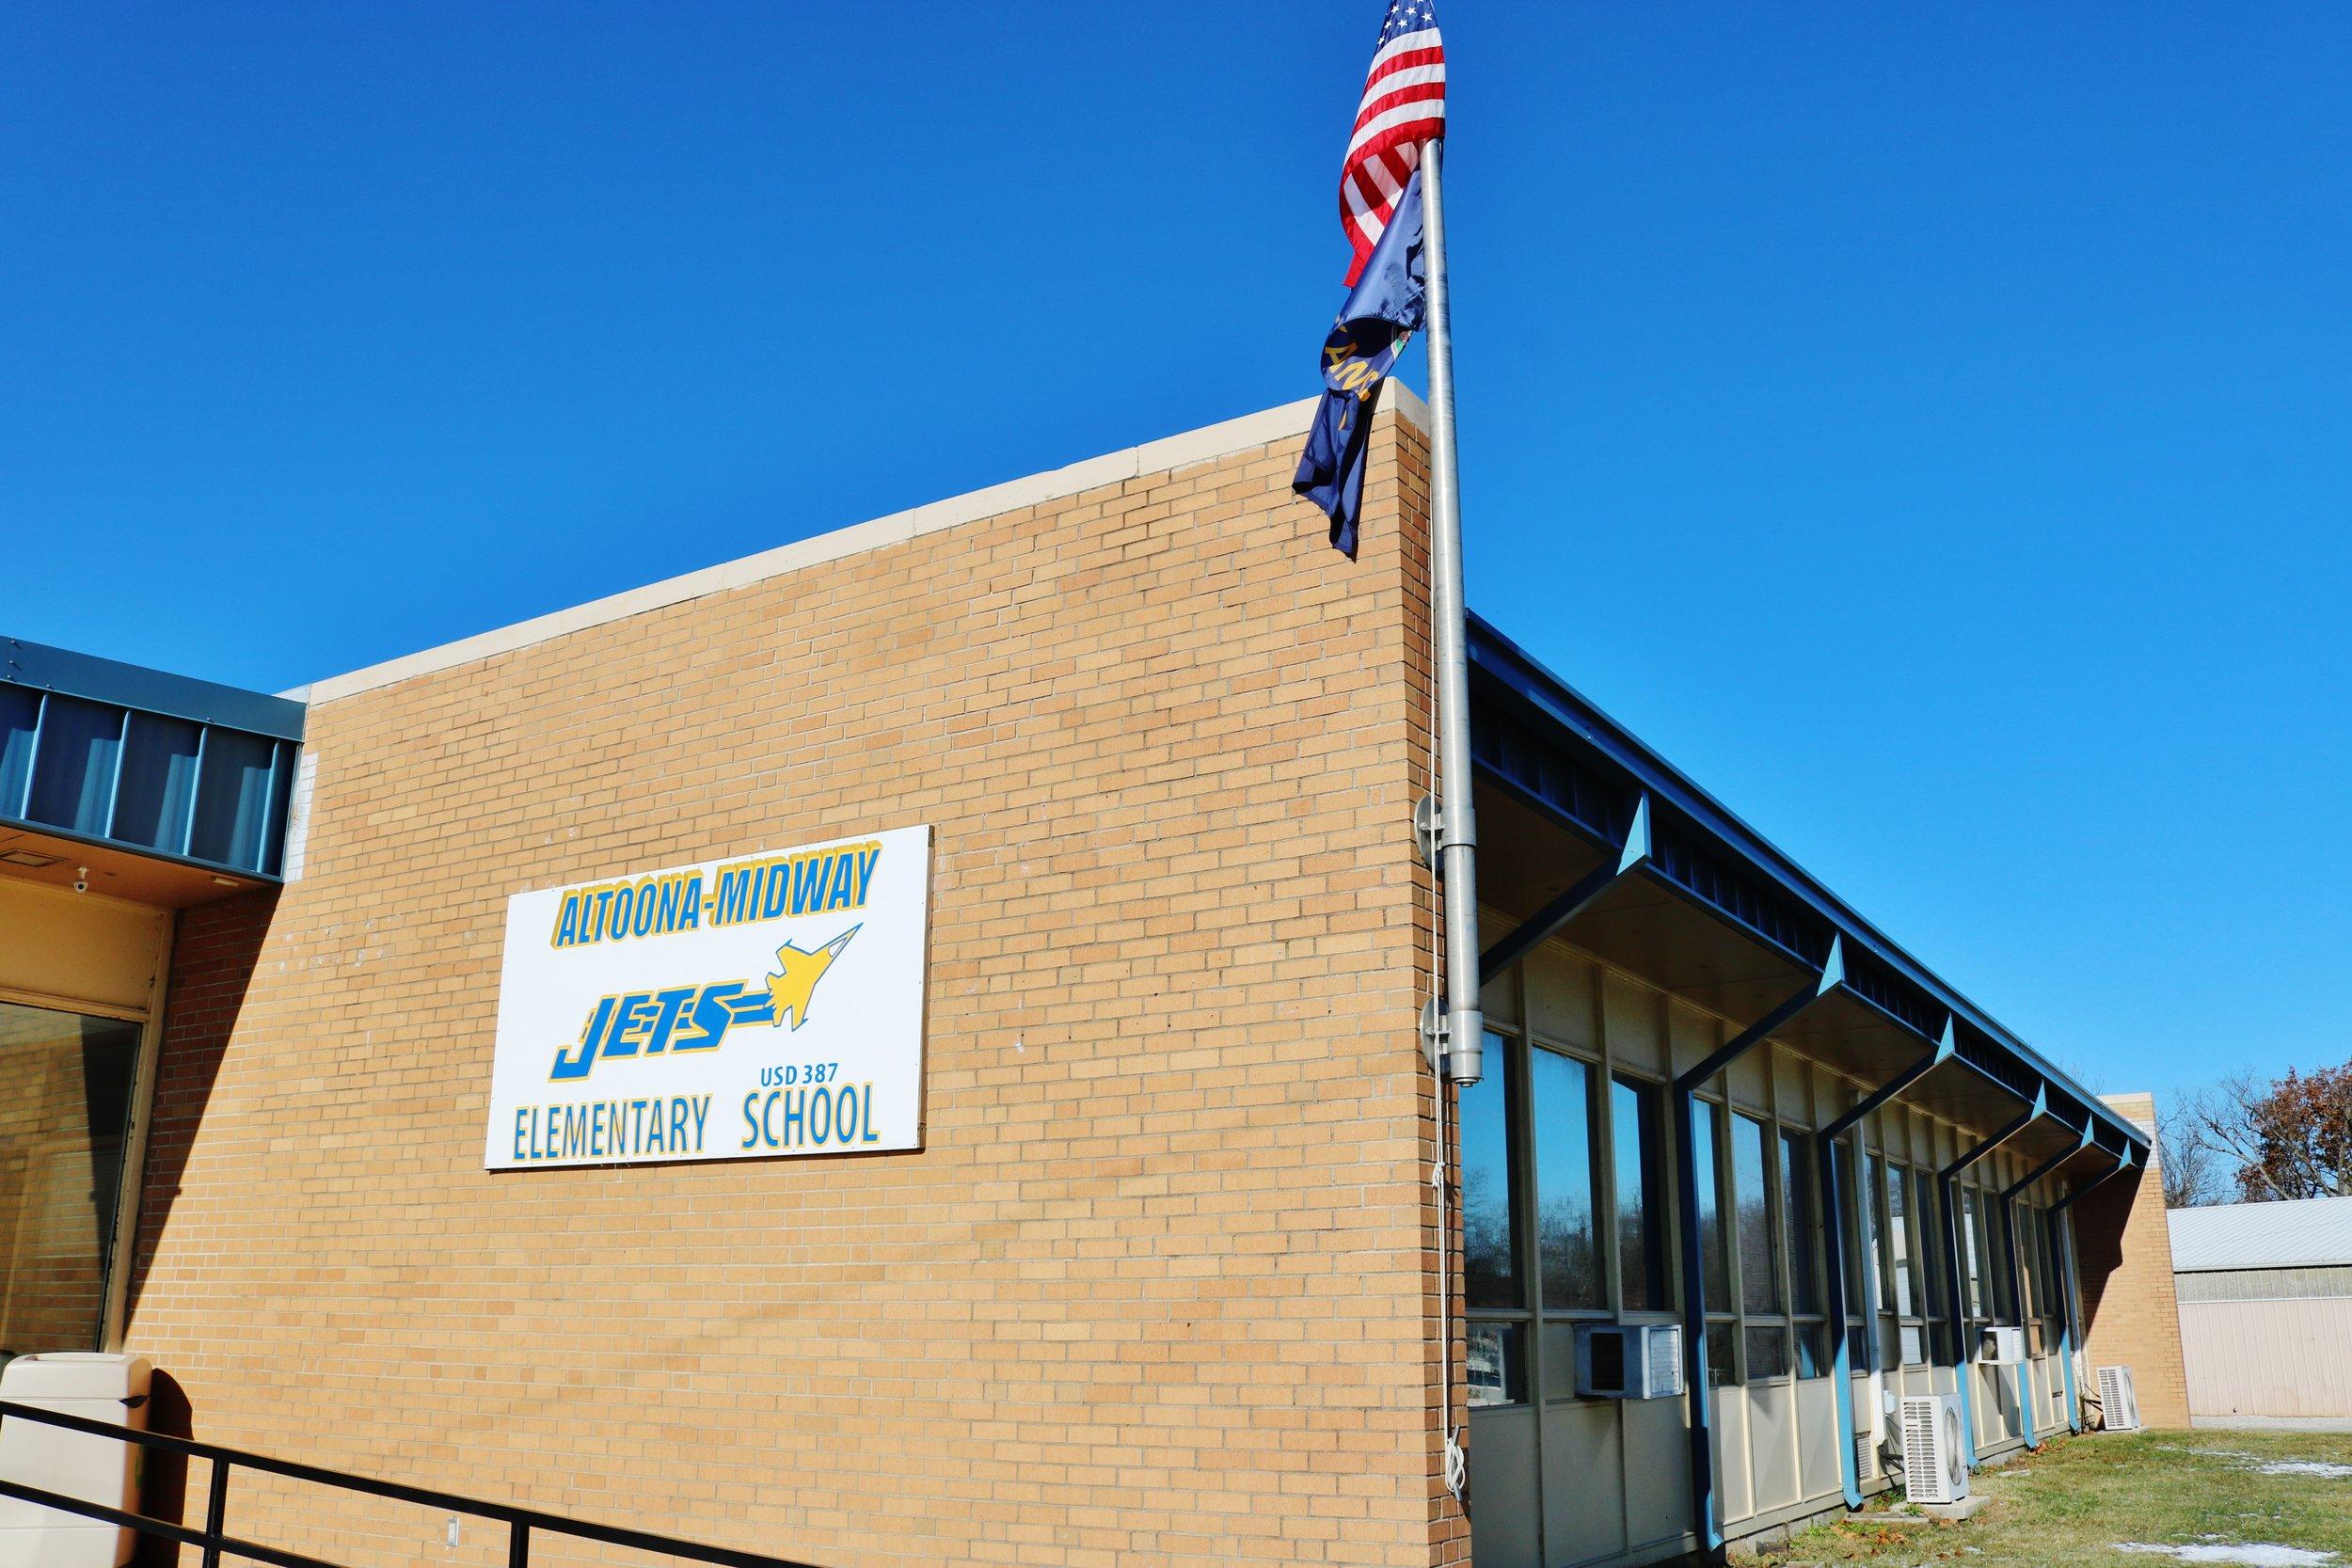 altoona-midway elementary school